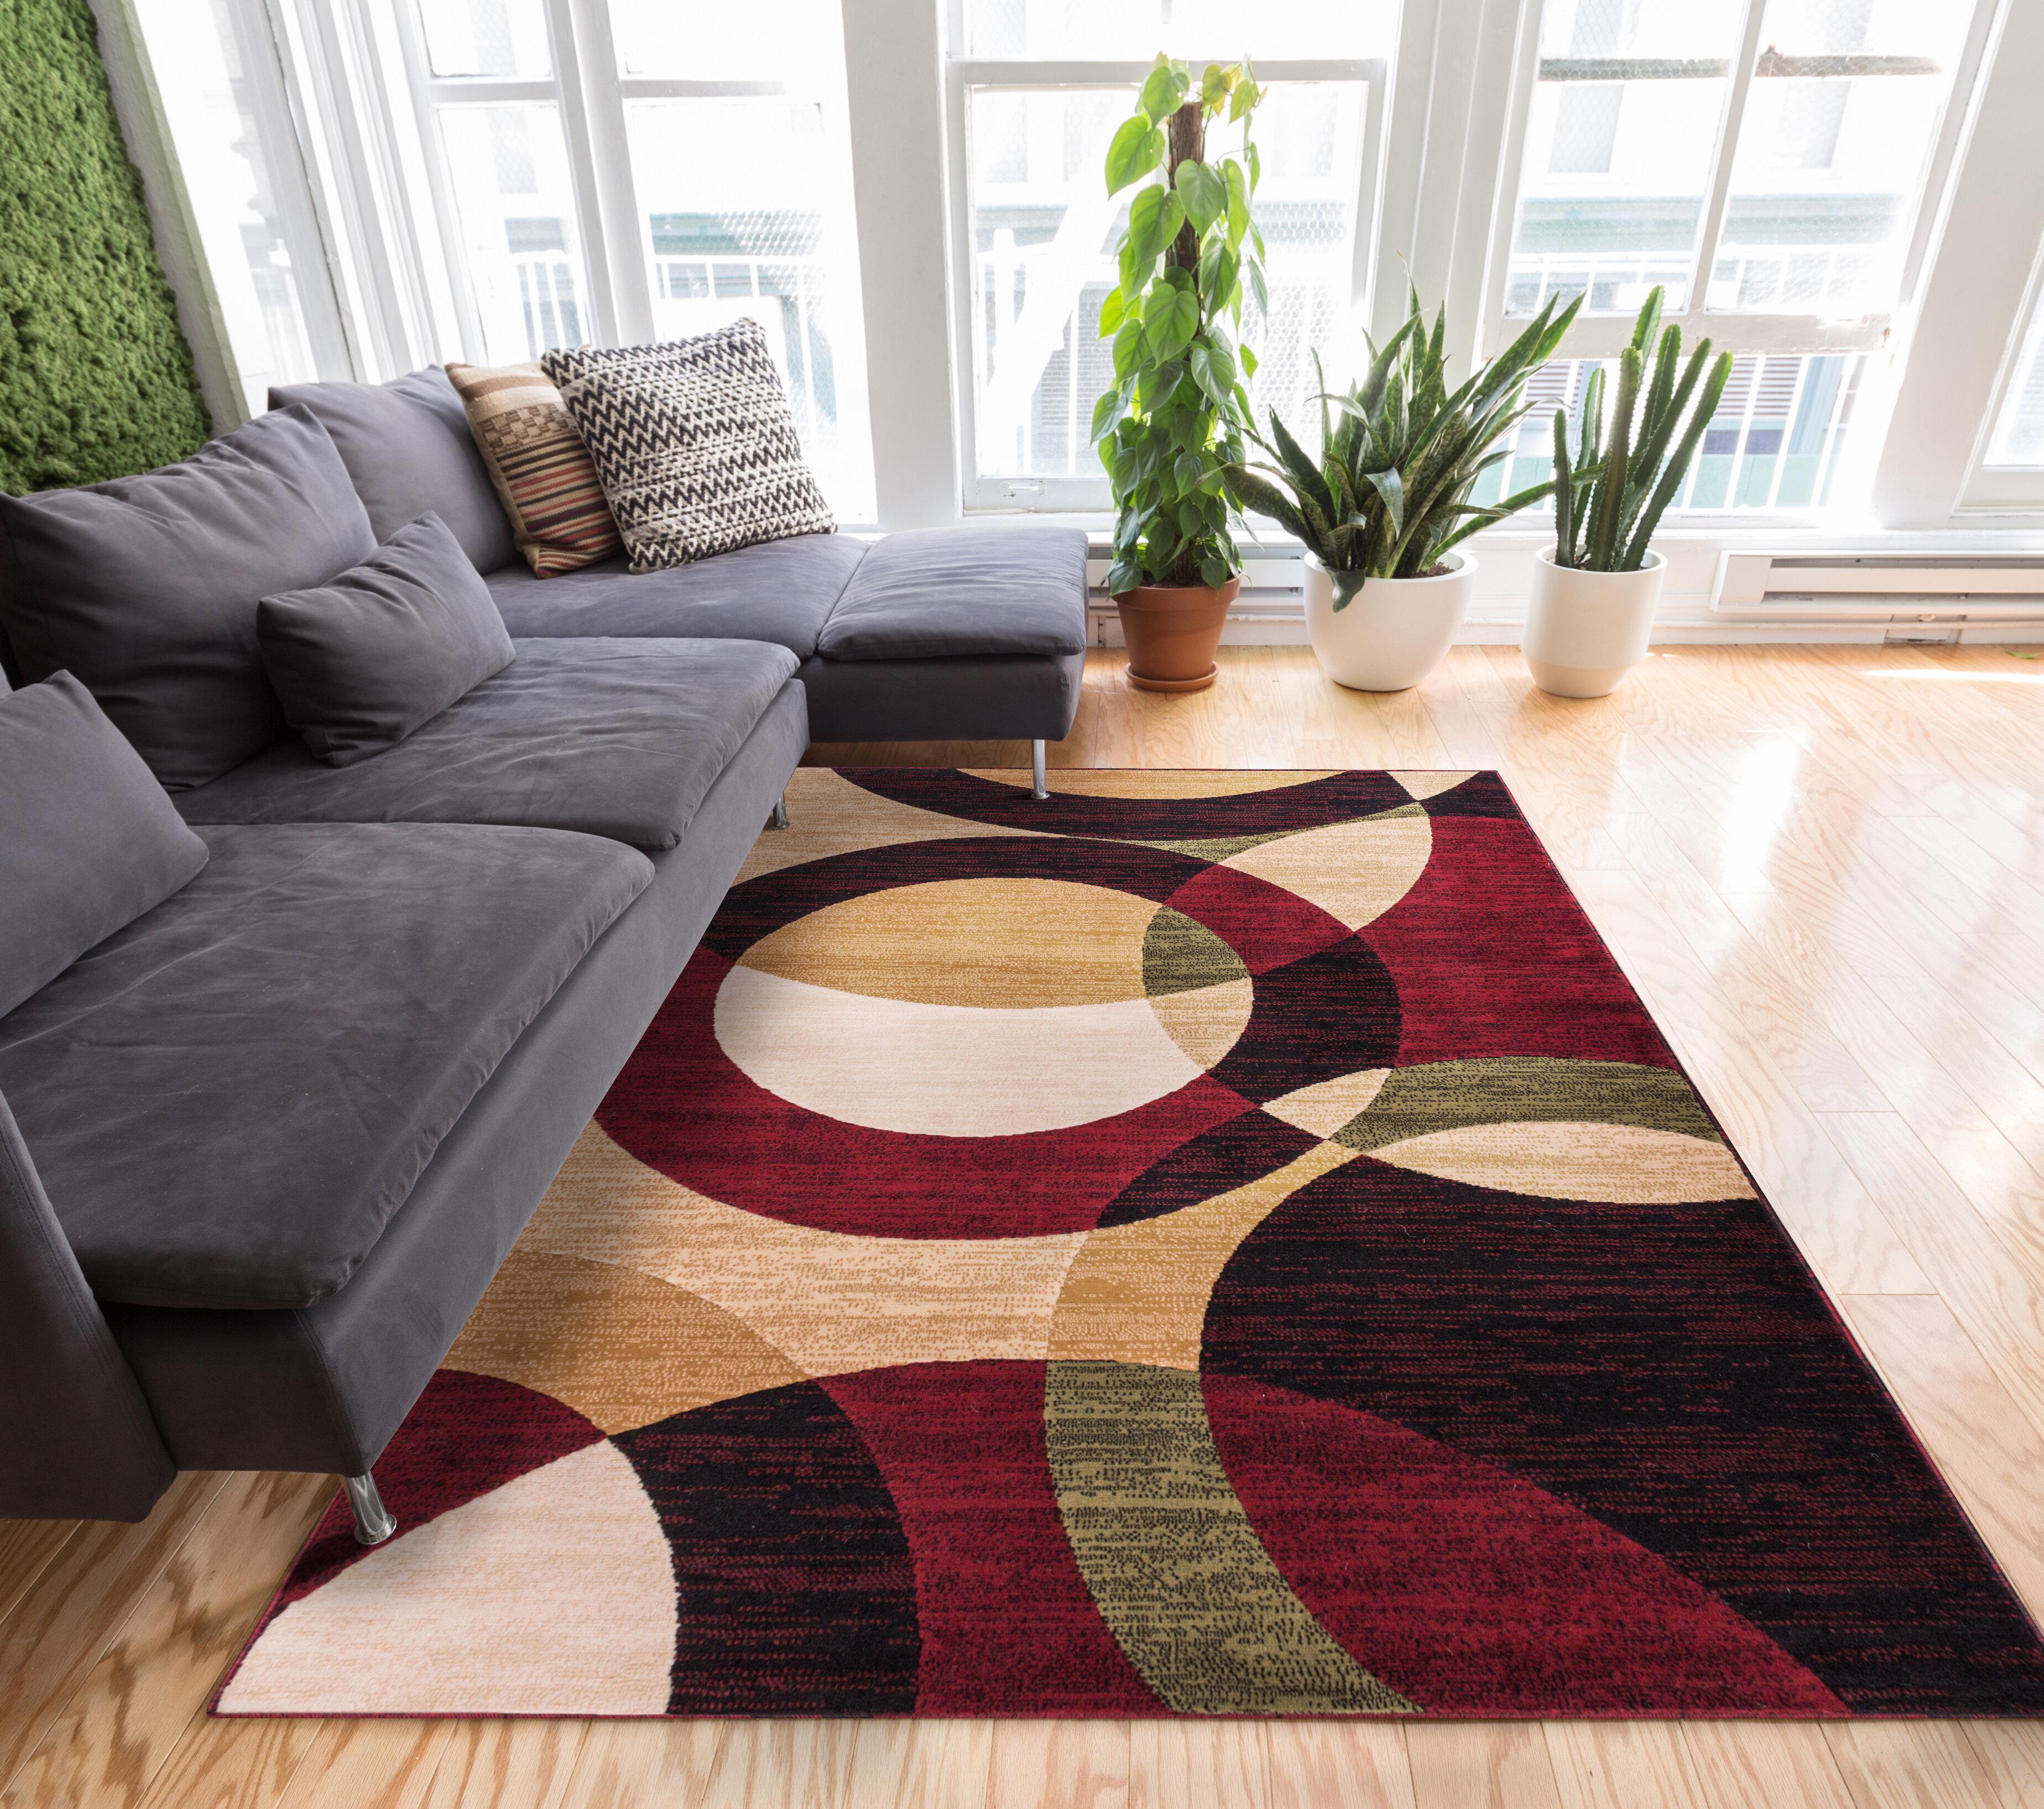 Ebern Designs Chelsi Geometric Red Beige Area Rug Reviews Wayfair